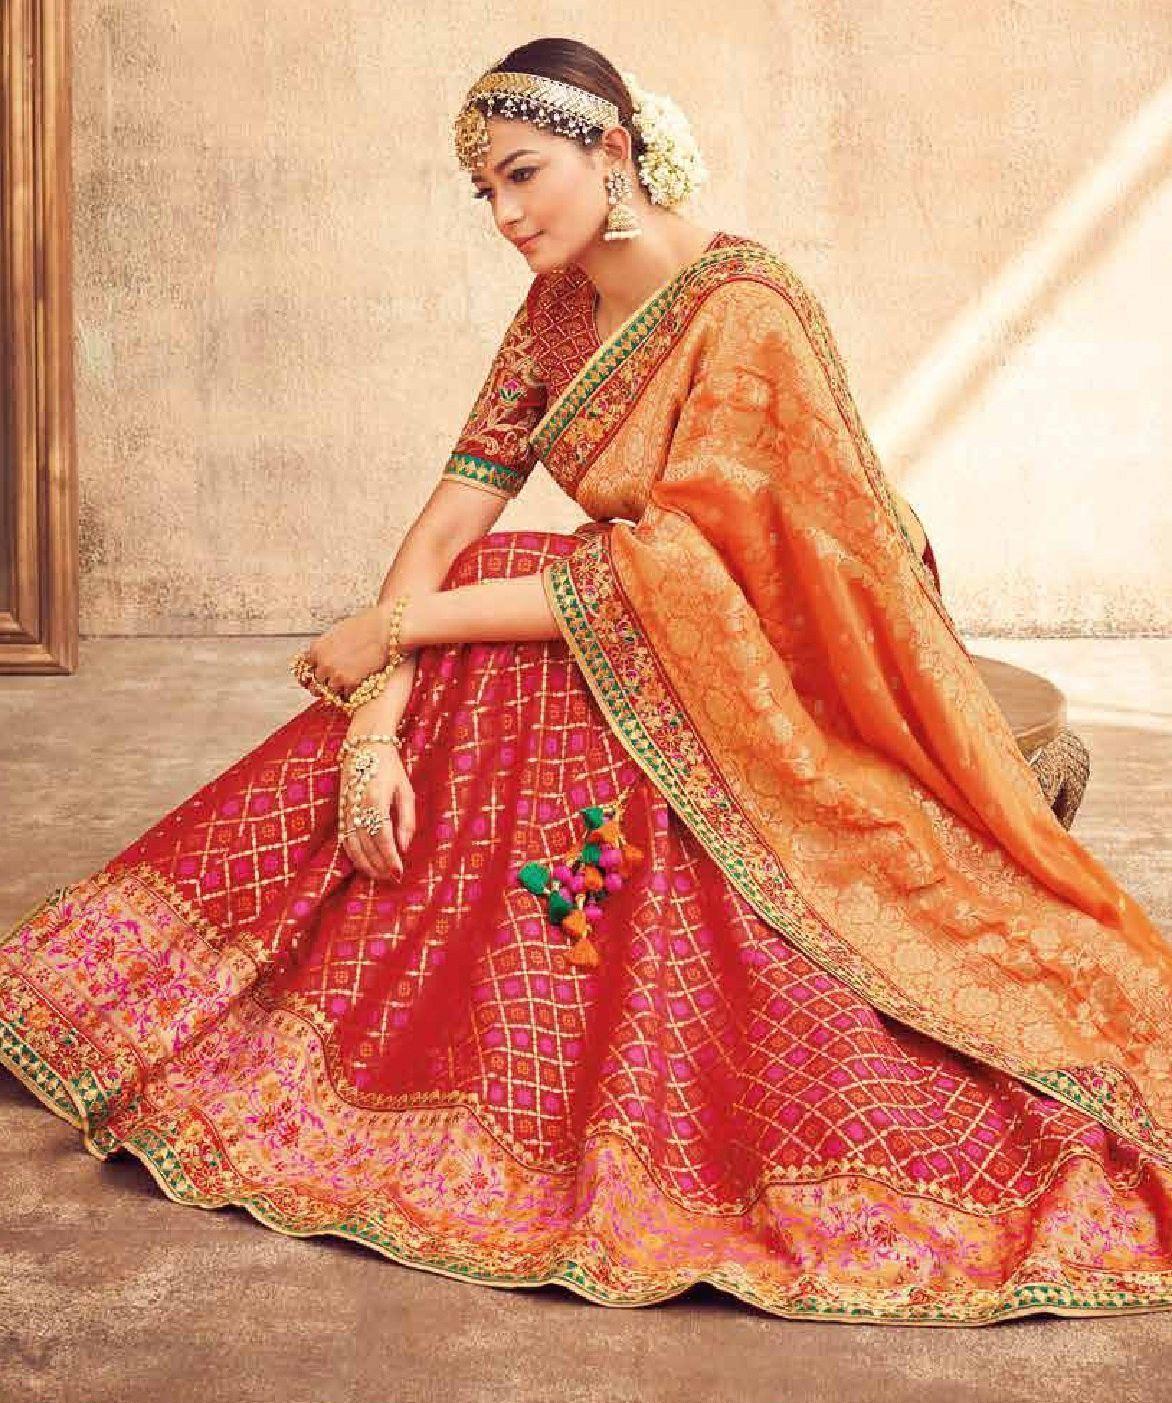 Buy Red and Orange silk Indian wedding lehenga in UK, USA